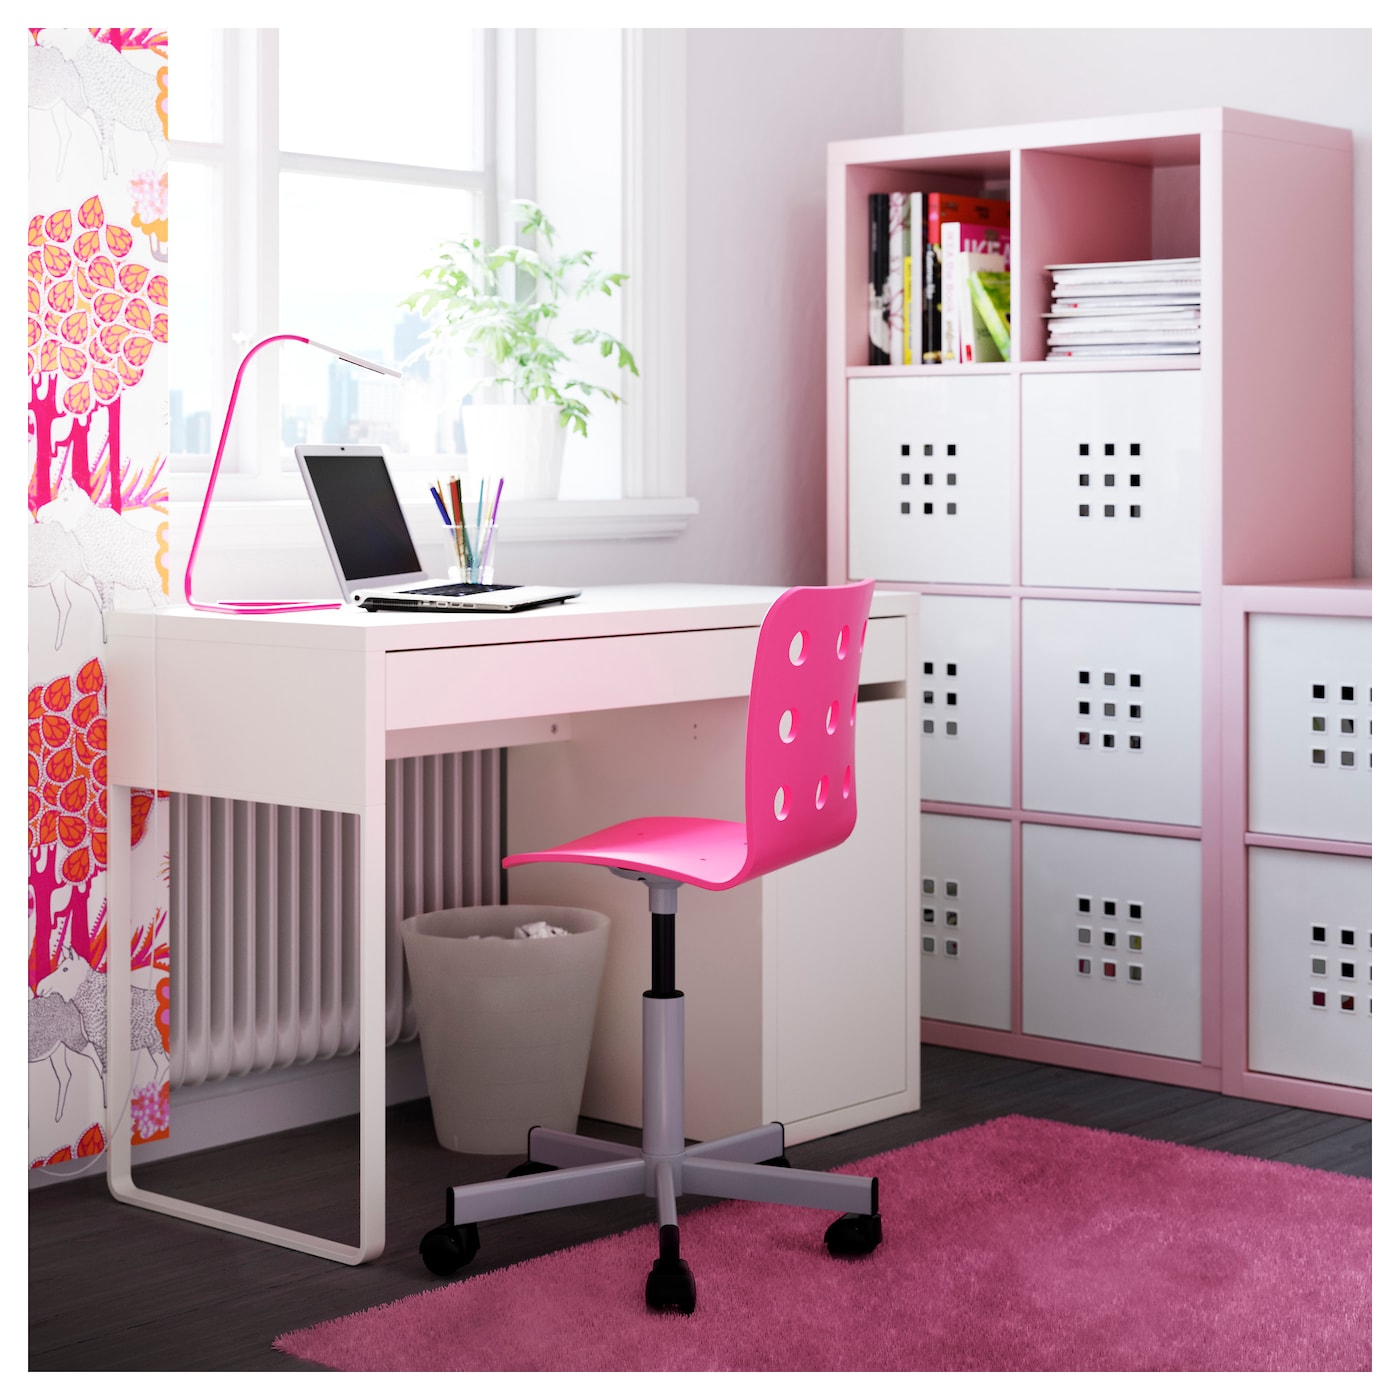 ikea junior desk chair ergonomic accessories jules pink silver colour